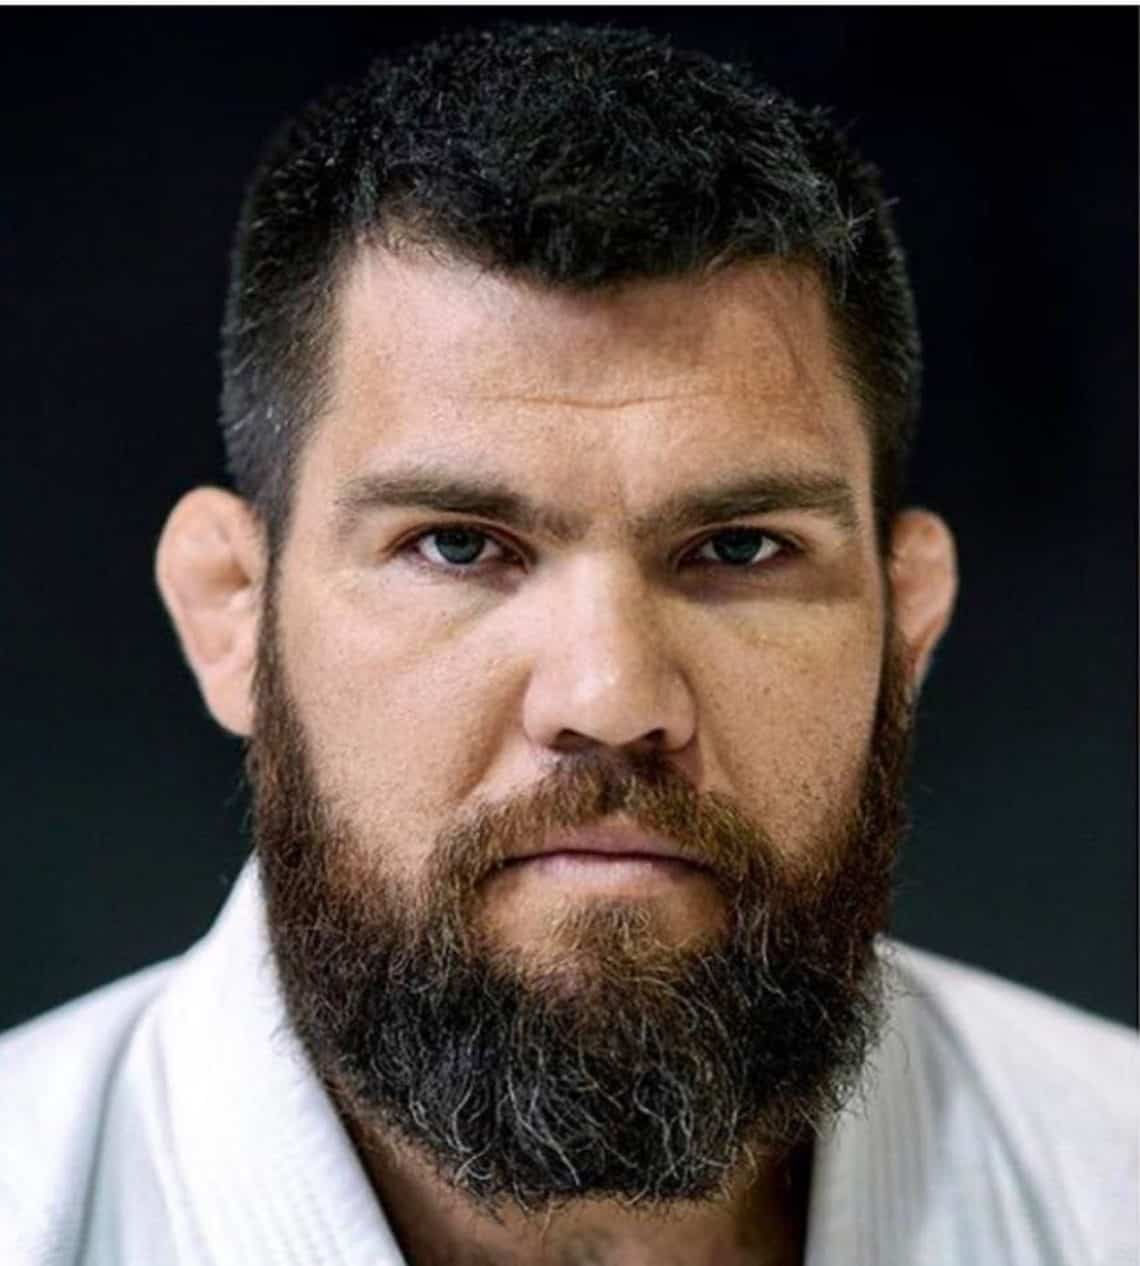 Robert Drysdale chiude la sua carriera di lottatore 1